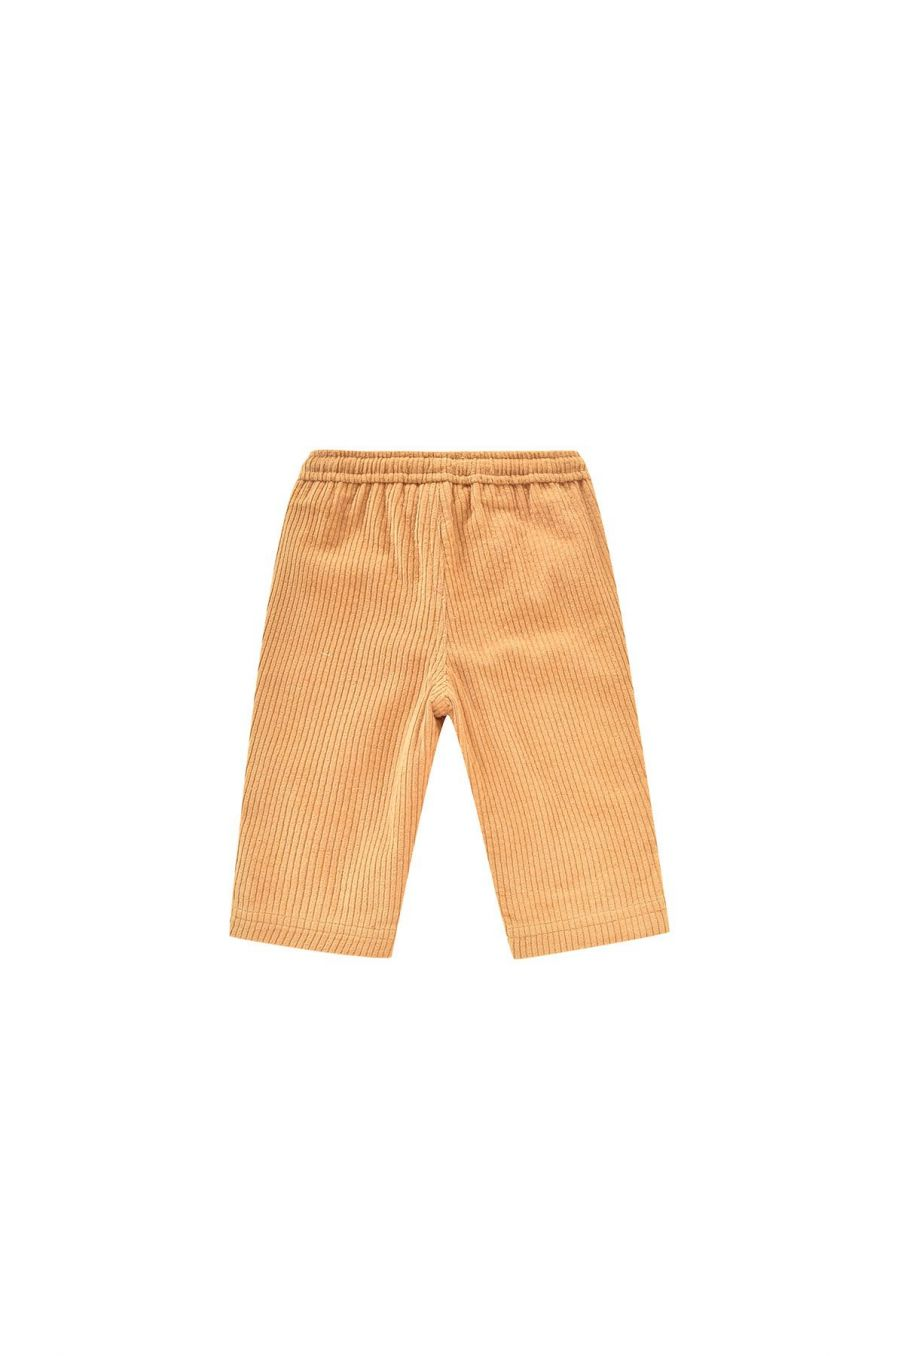 pantalon bebe garcon abel camel - louise misha